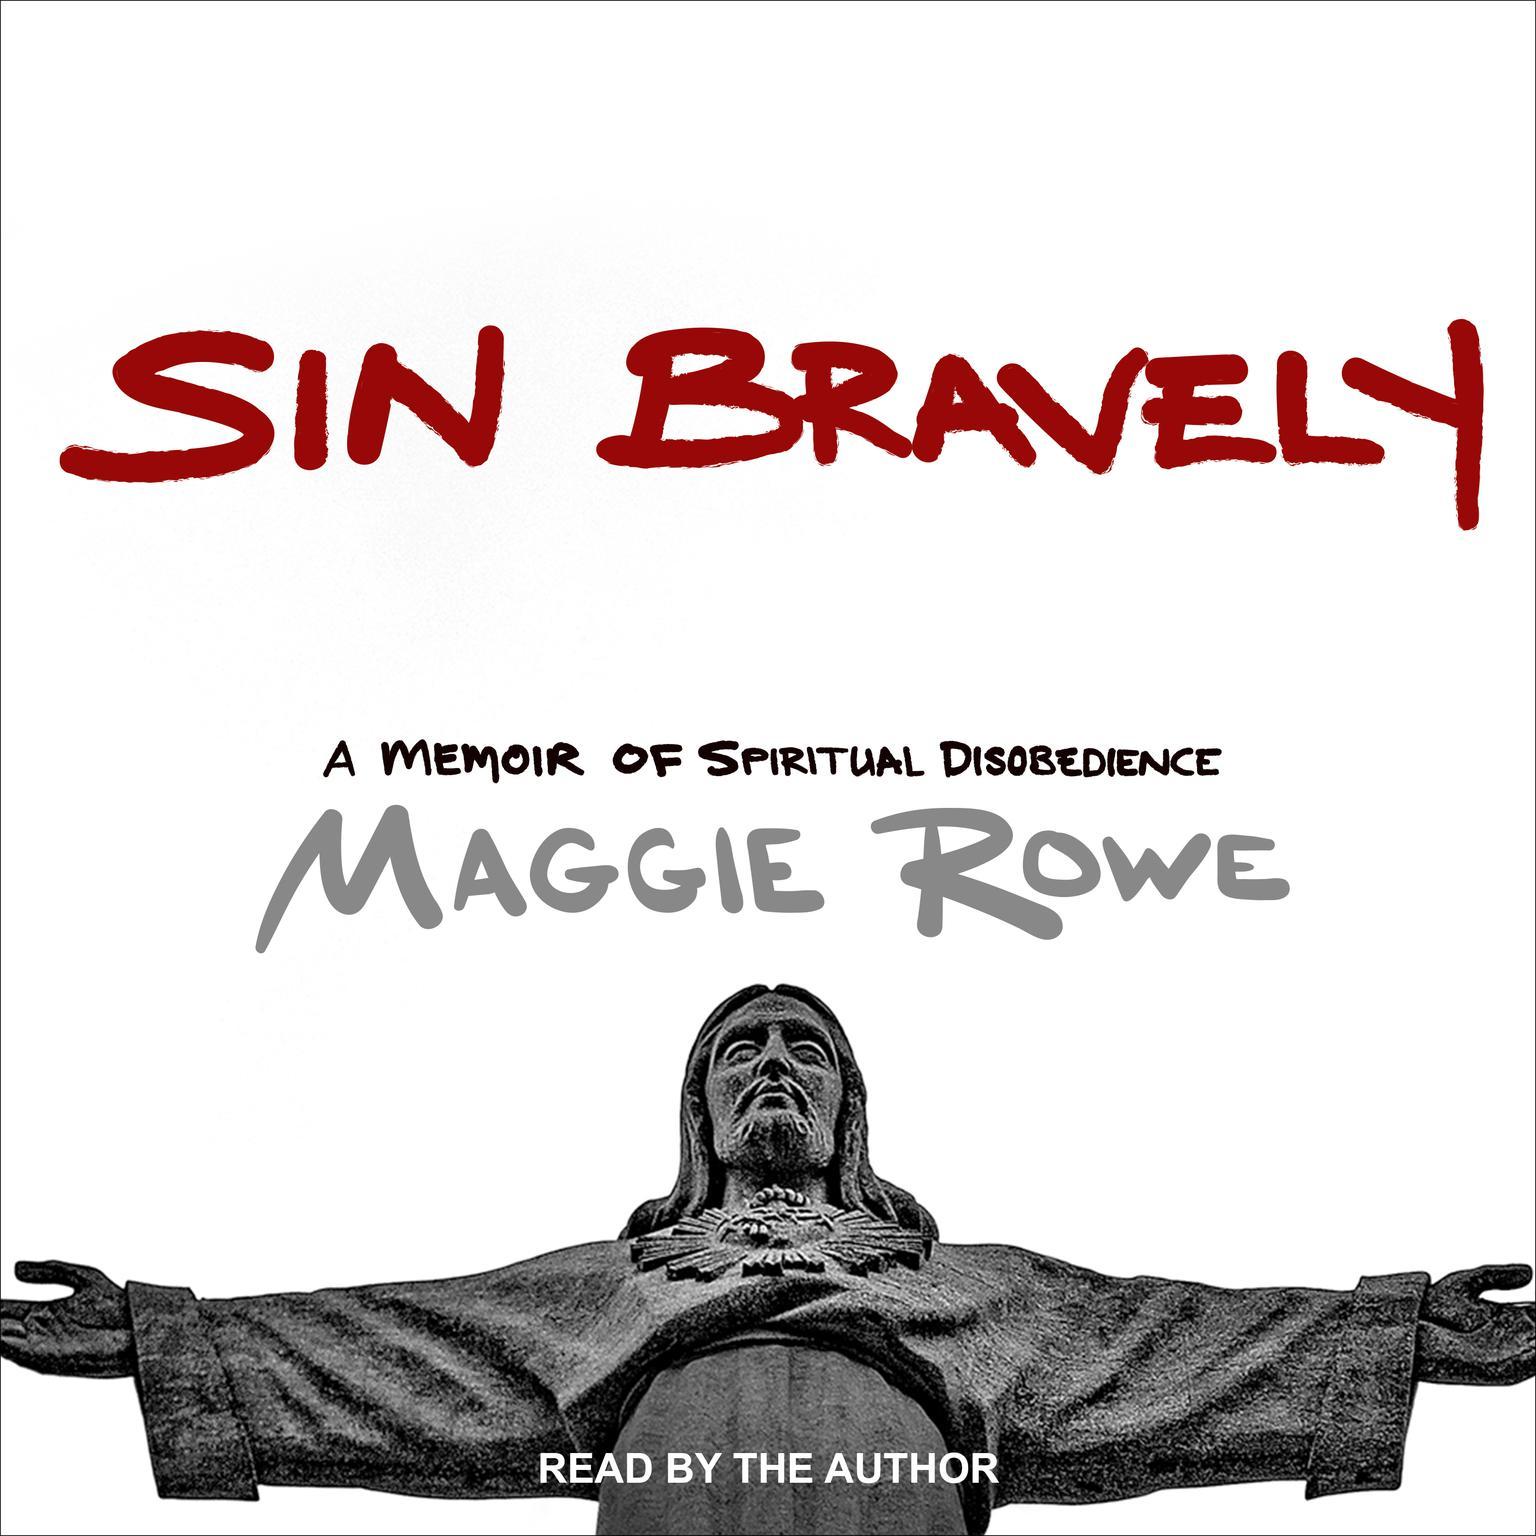 Sin Bravely: A Memoir of Spiritual Disobedience Audiobook, by Maggie Rowe